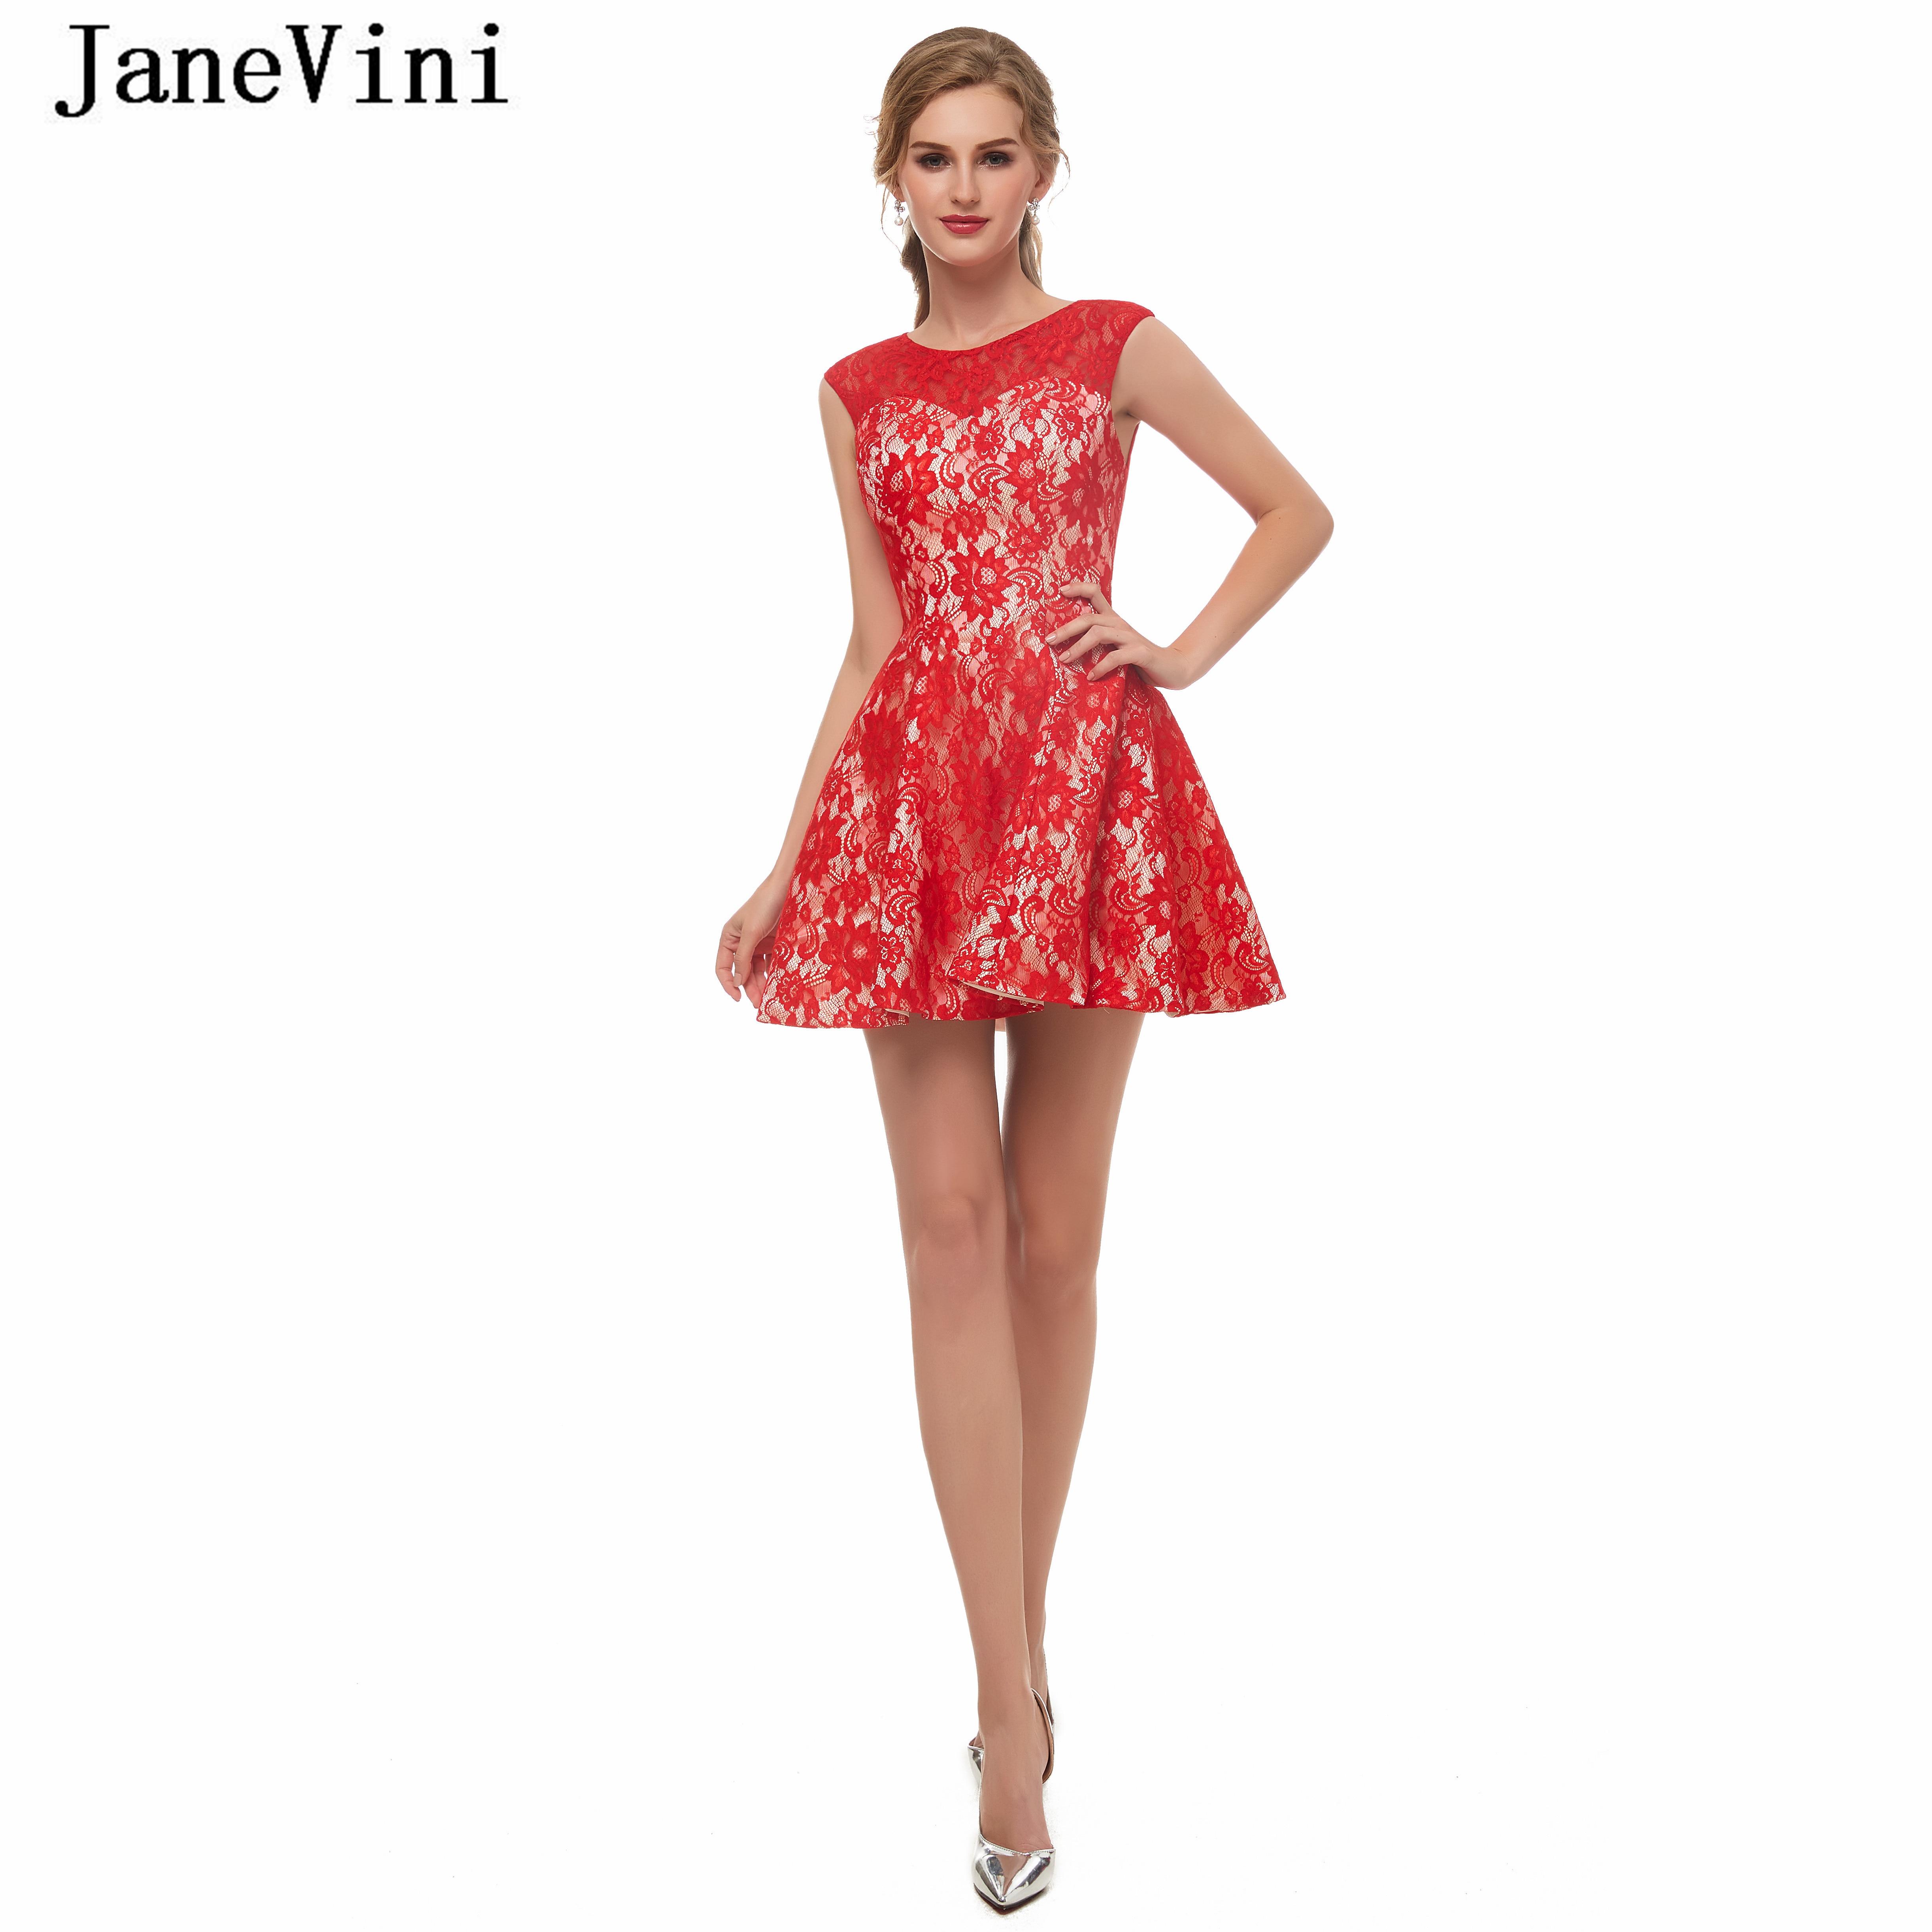 JaneVini-فستان أحمر قصير مع تقويرة على شكل حرف A ، ملابس أنيقة ، مع سحاب خلفي ، دانتيل ، مقاس كبير ، 2019